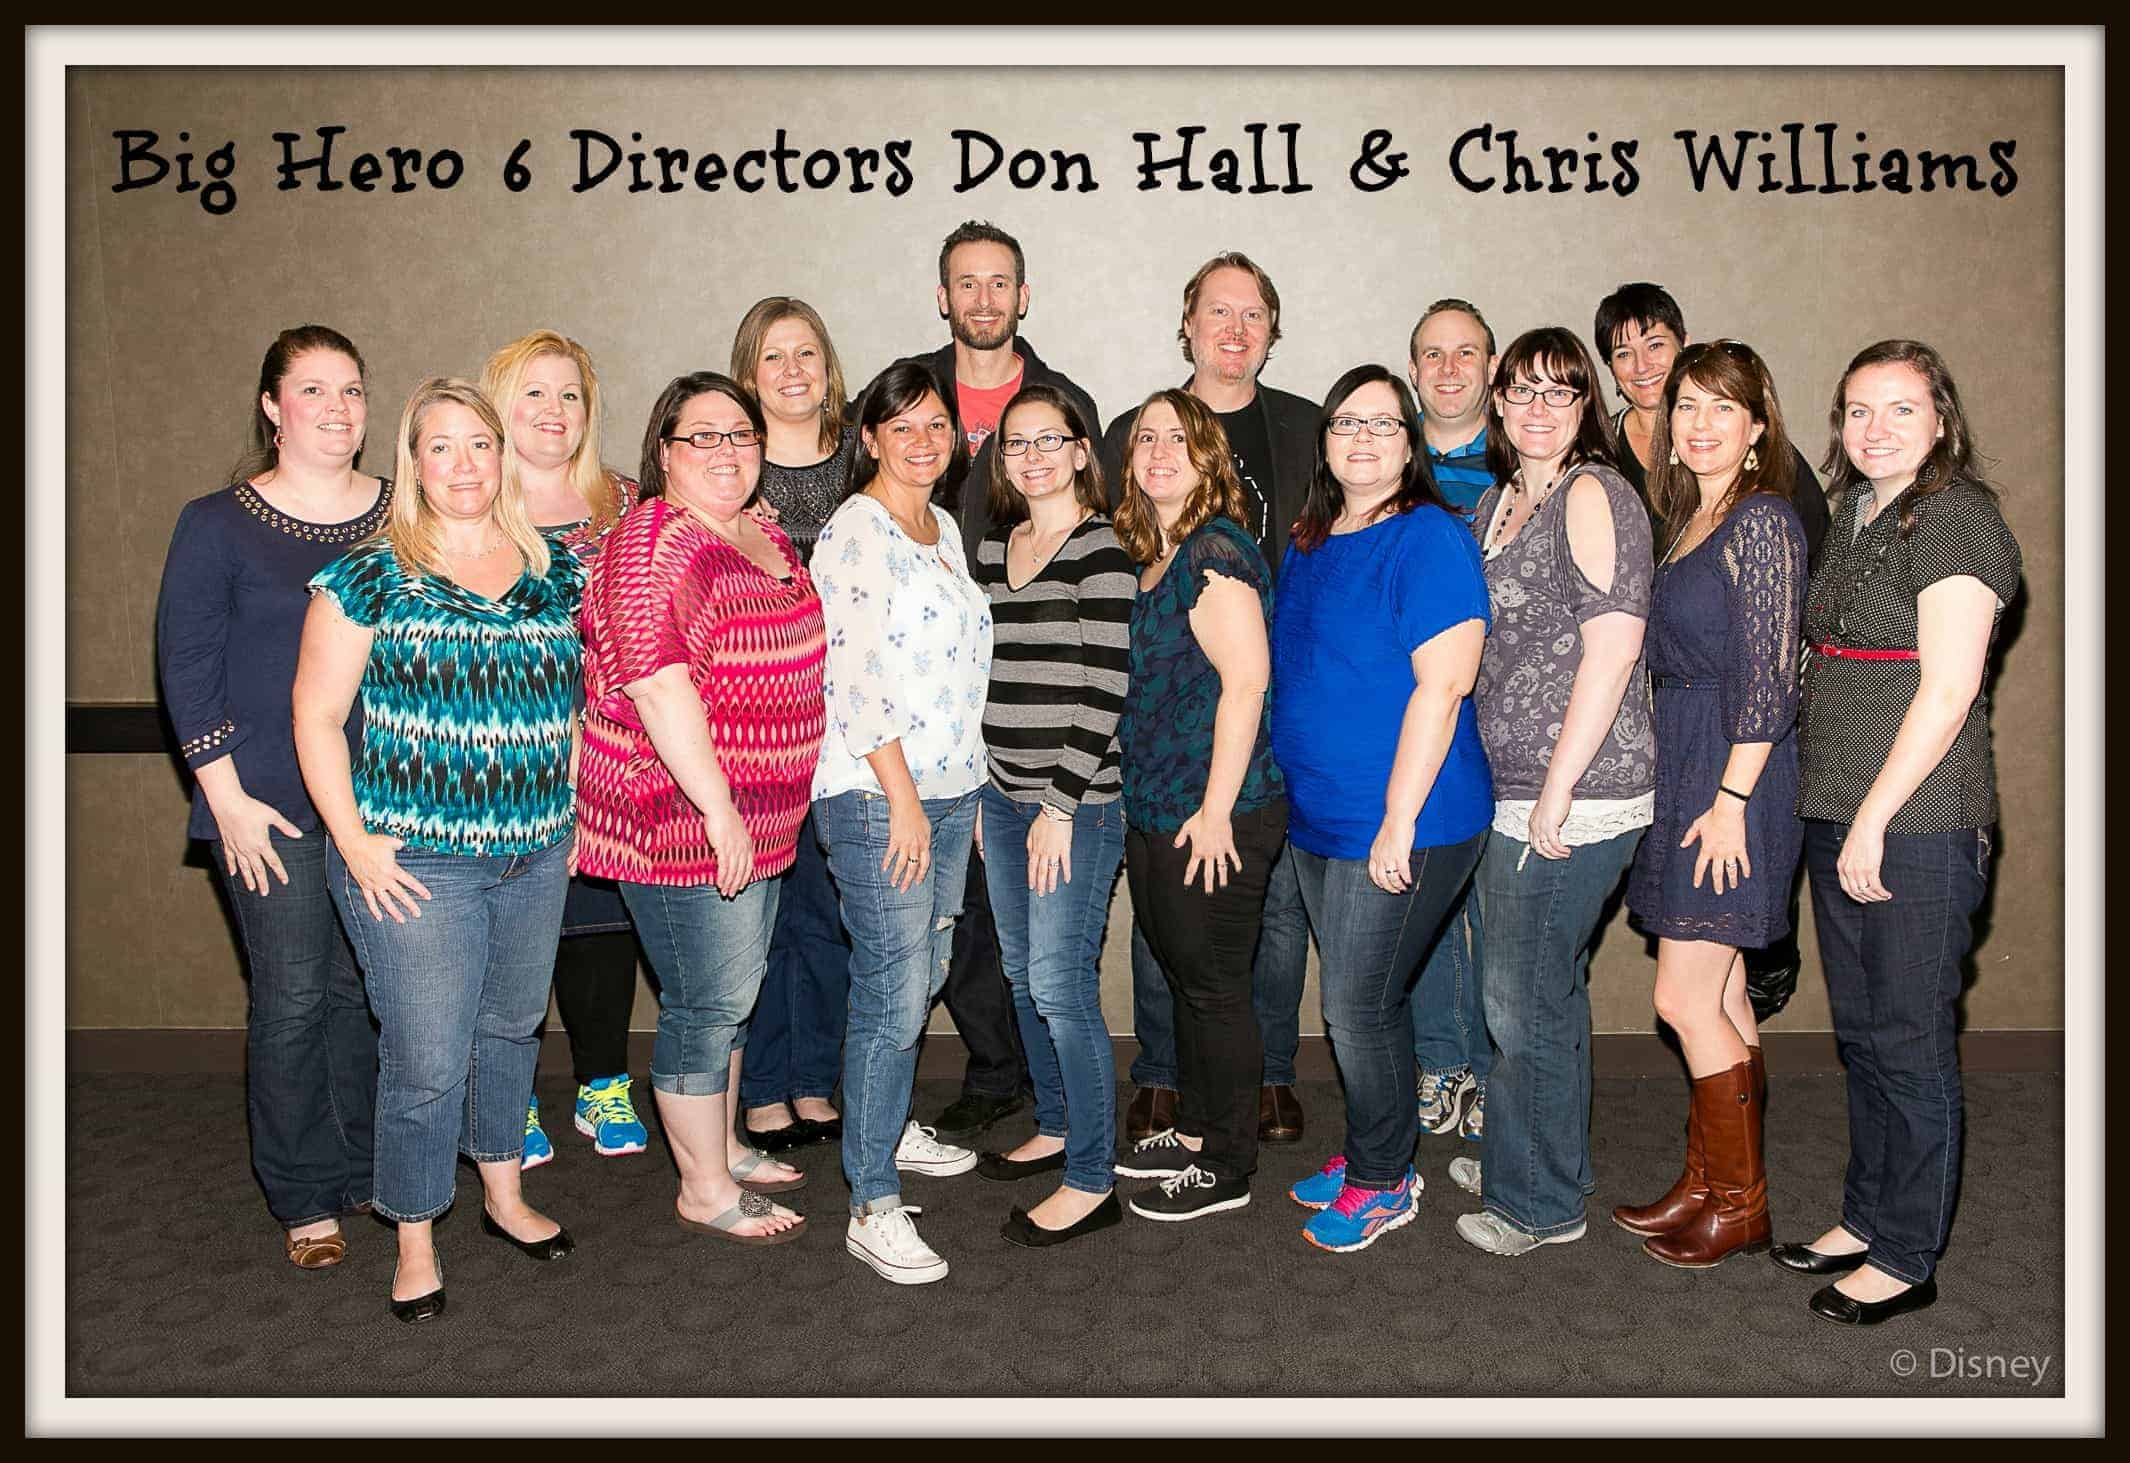 Big Hero 6 Directors Don Hall & Chris Williams